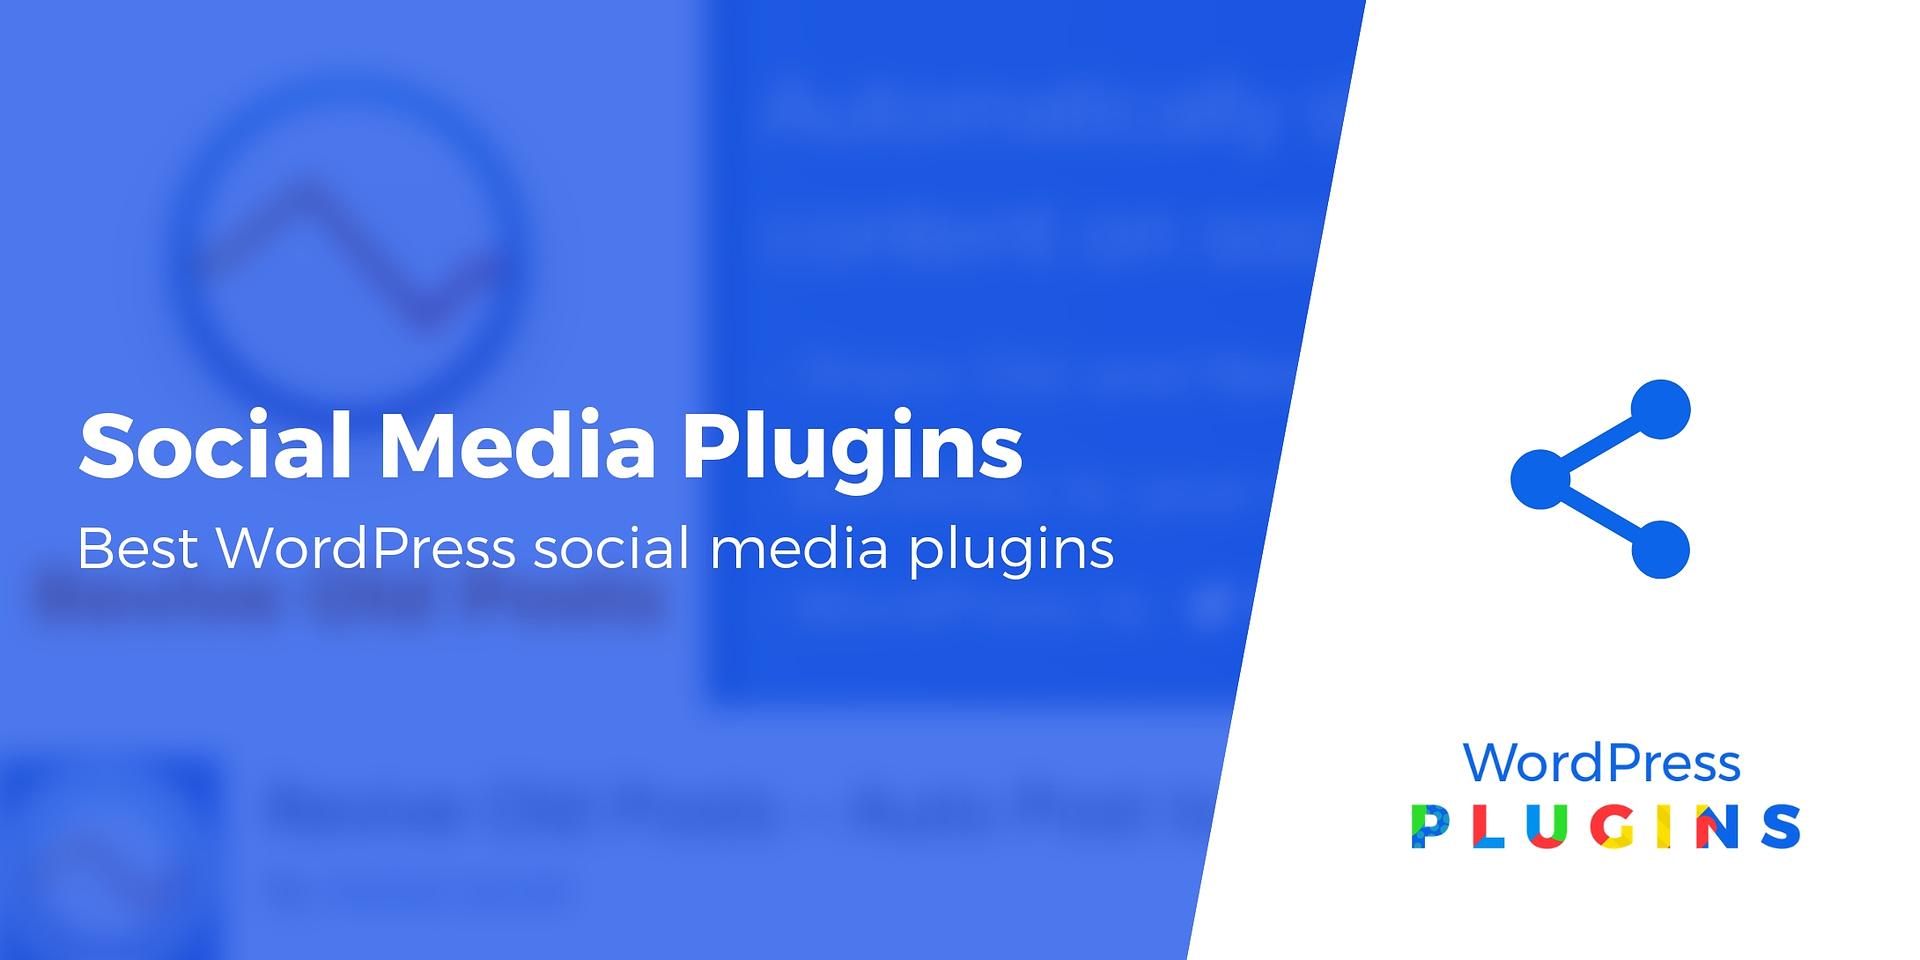 ThemeIsle Blog - WordPress Tutorials and Reviews for